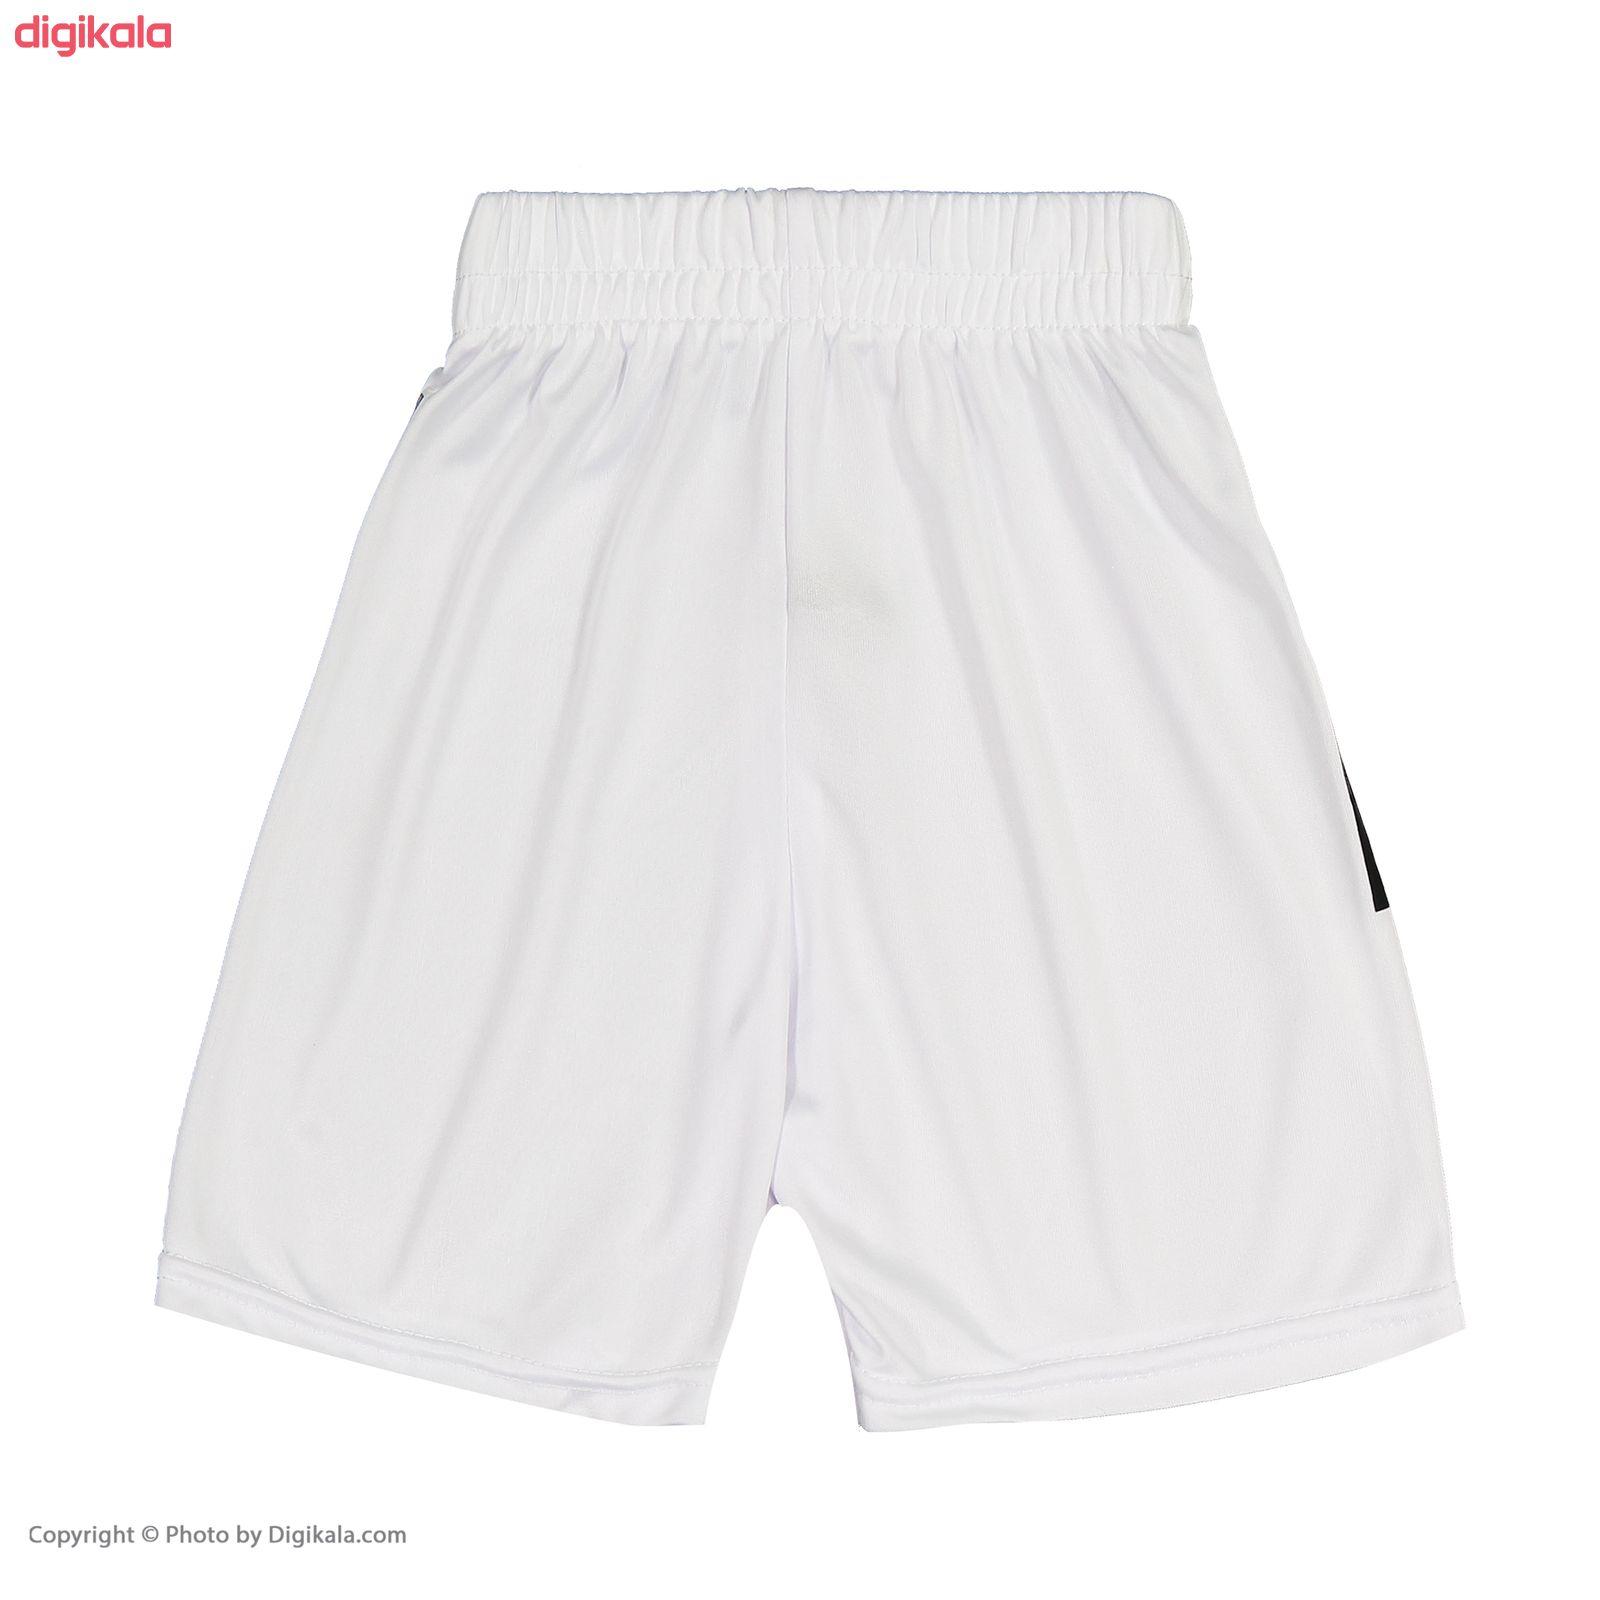 ست پیراهن و شورت ورزشی پسرانه طرح یوونتوس مدل رونالدو کد p.sh.007 main 1 6